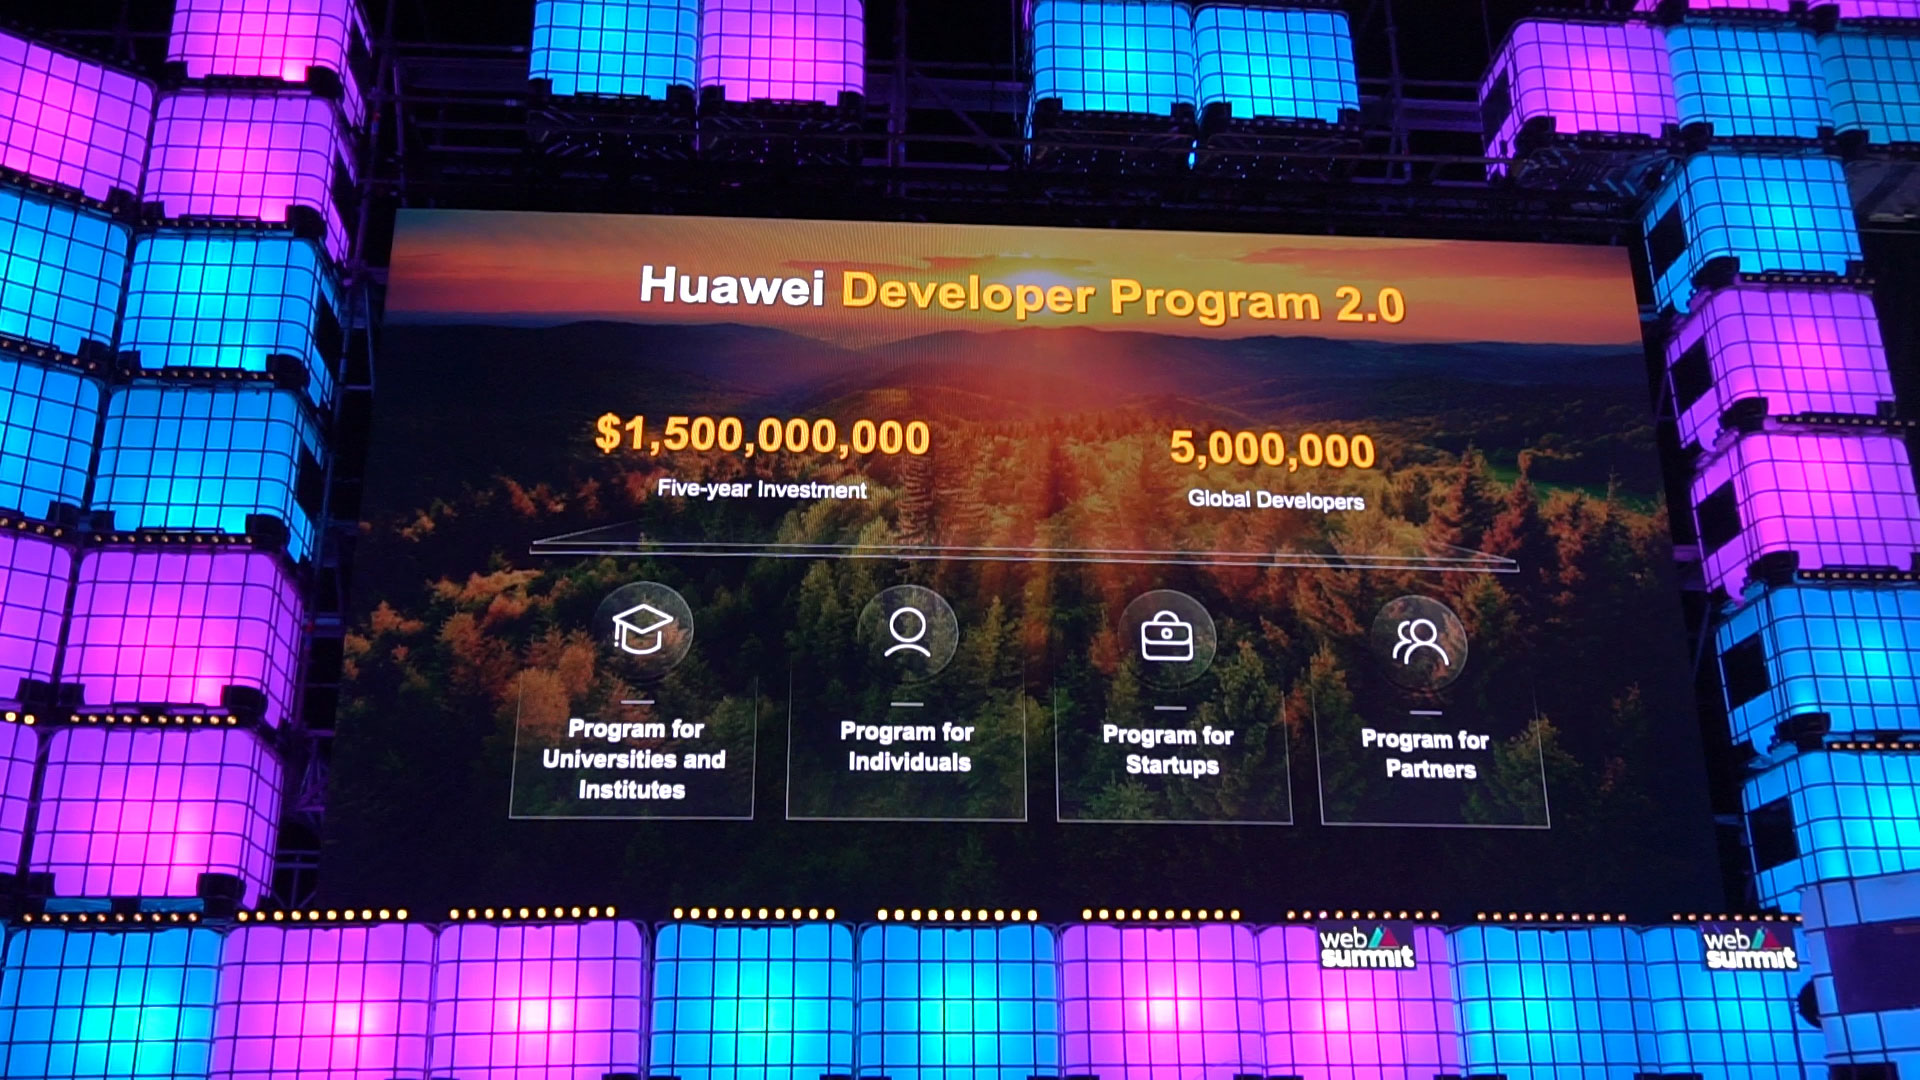 Huawei Developer Program